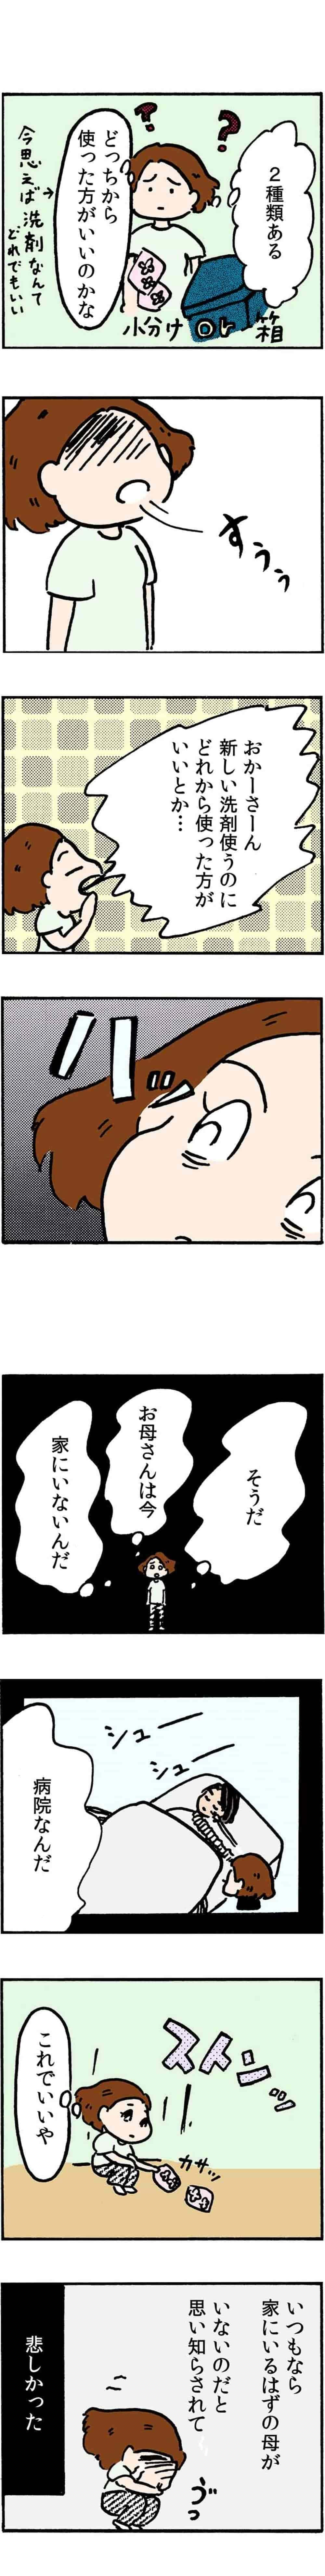 12dai8wa-min